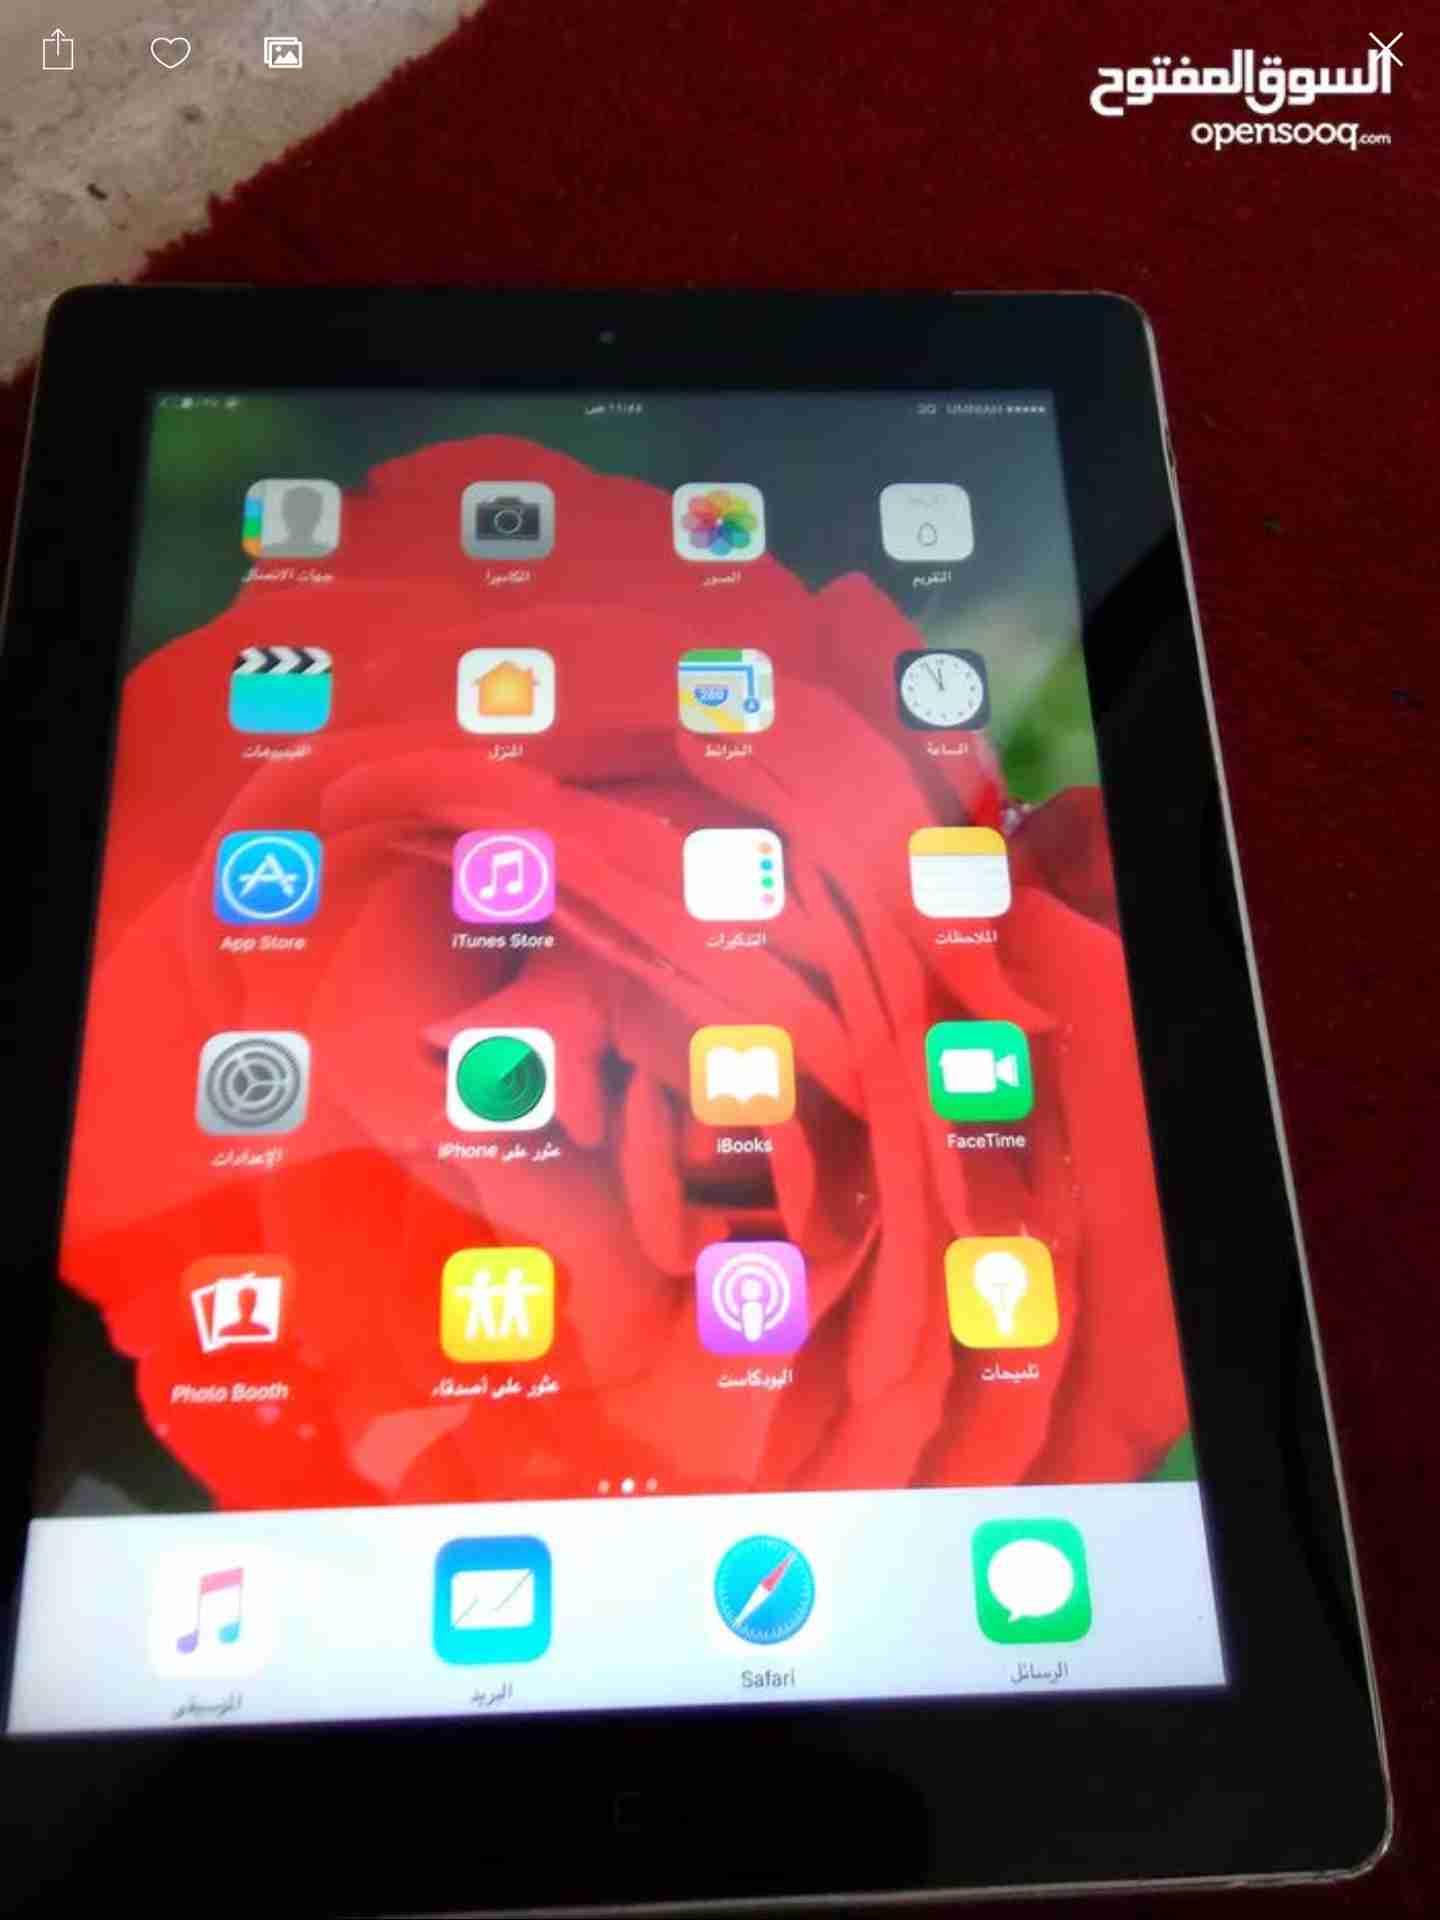 apple Original Ipad 4 cellular-  ايباد 4 بيع او بدل لا...